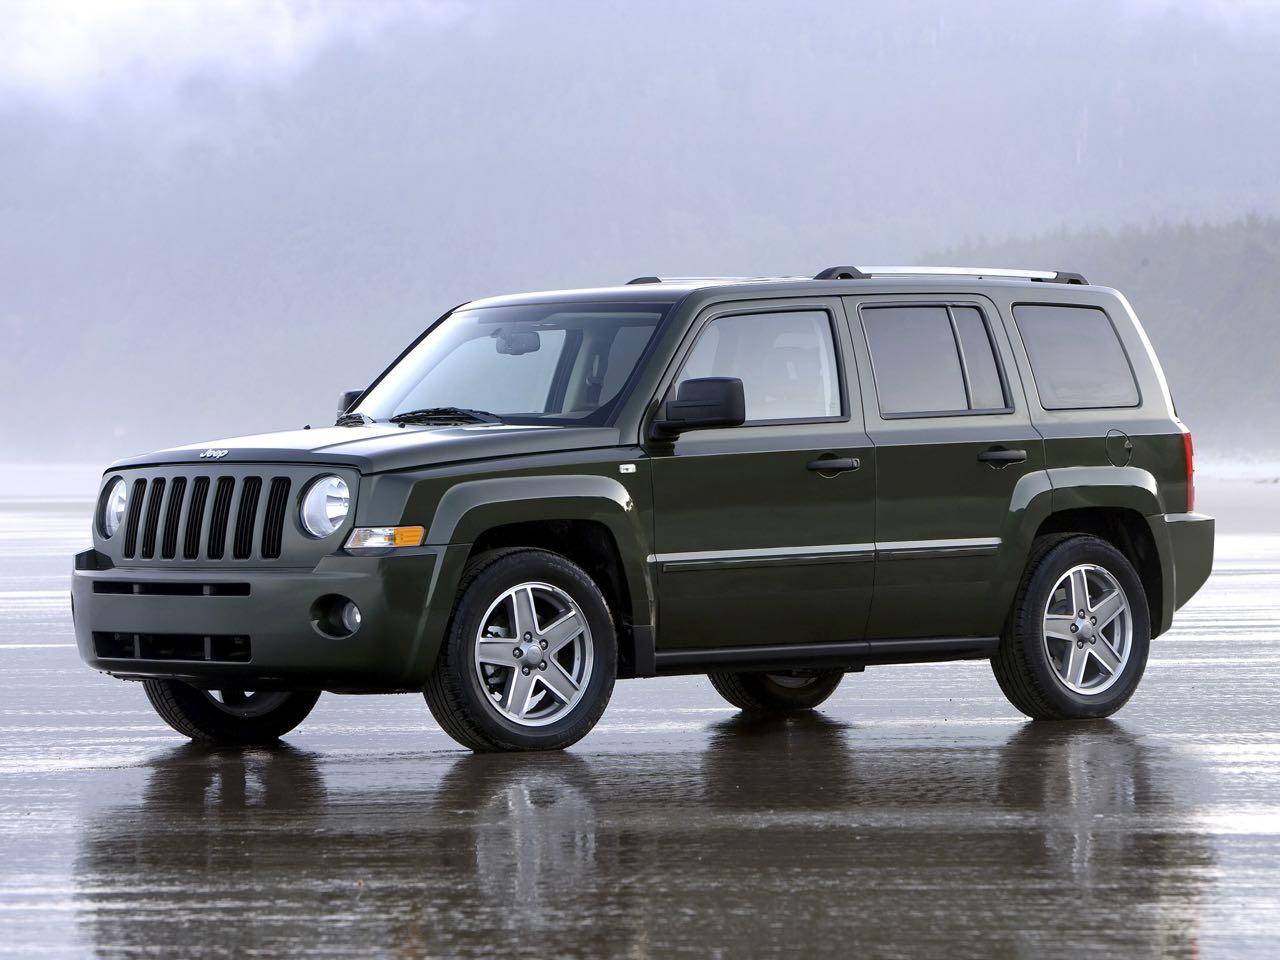 Jeep Patriot 2007 – 5